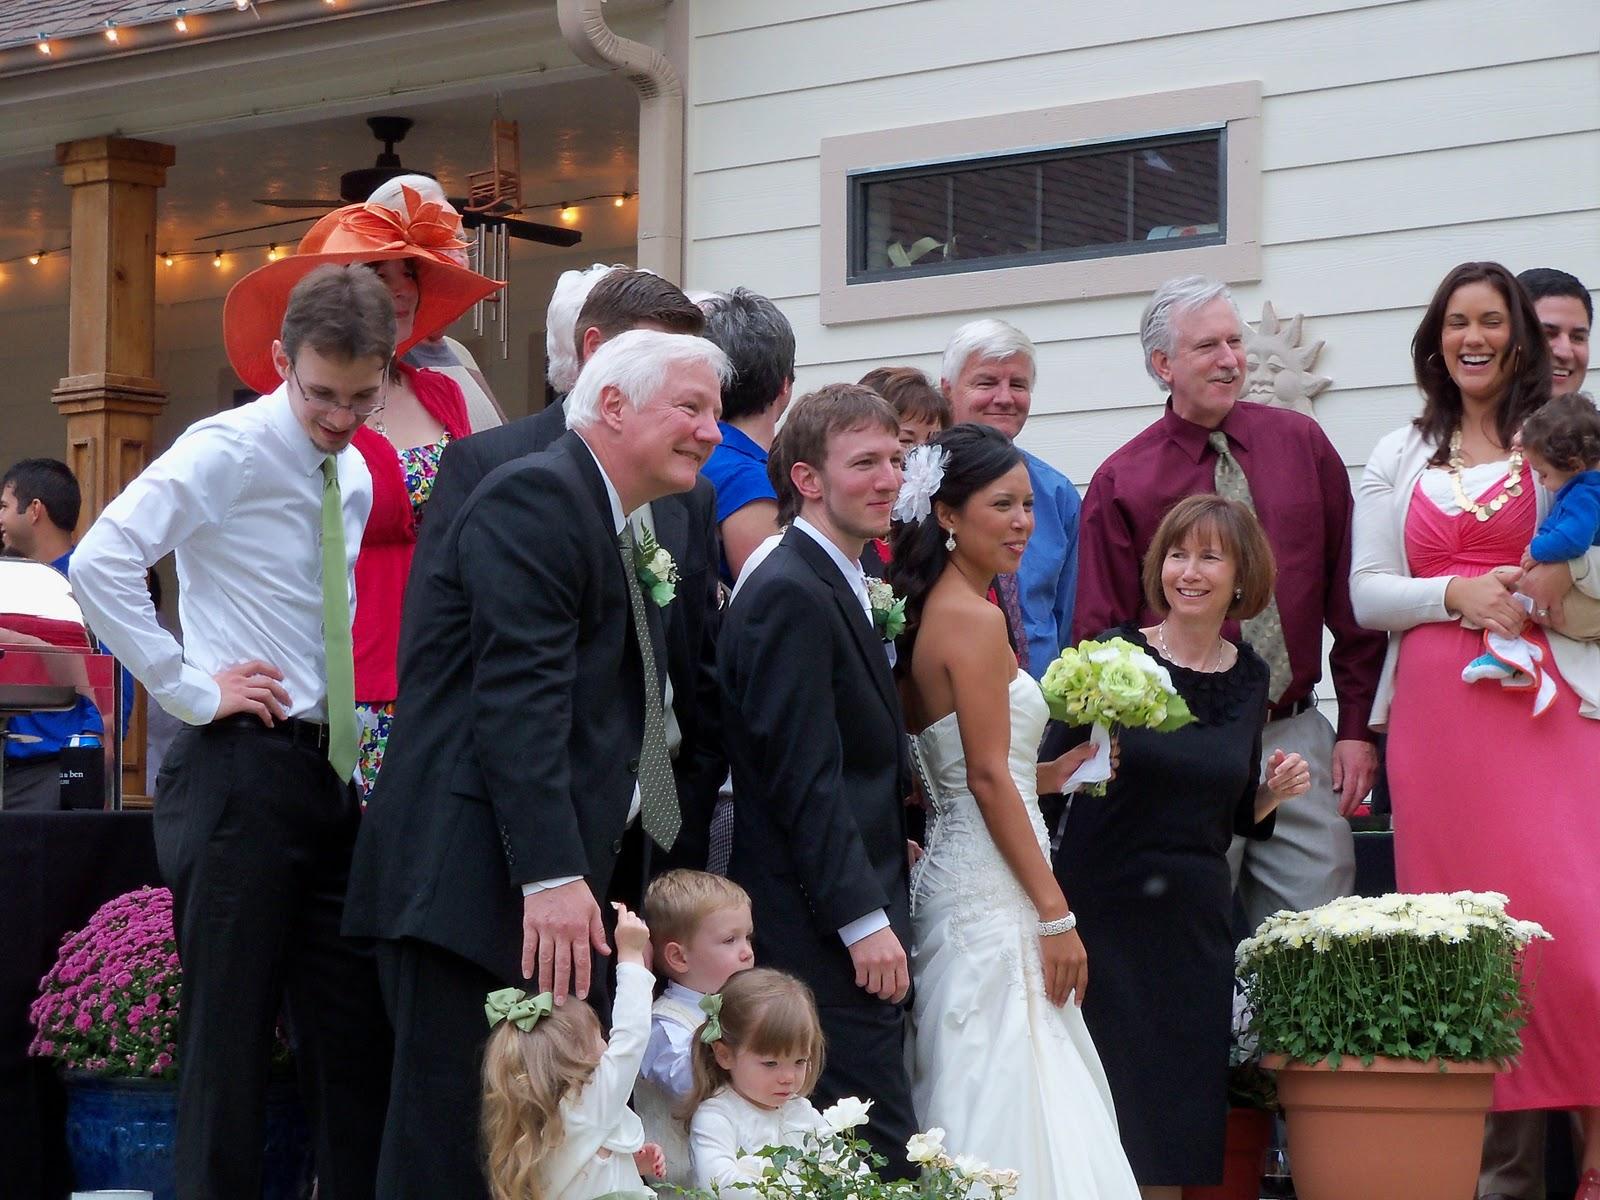 Ben and Jessica Coons wedding - 115_0804.JPG